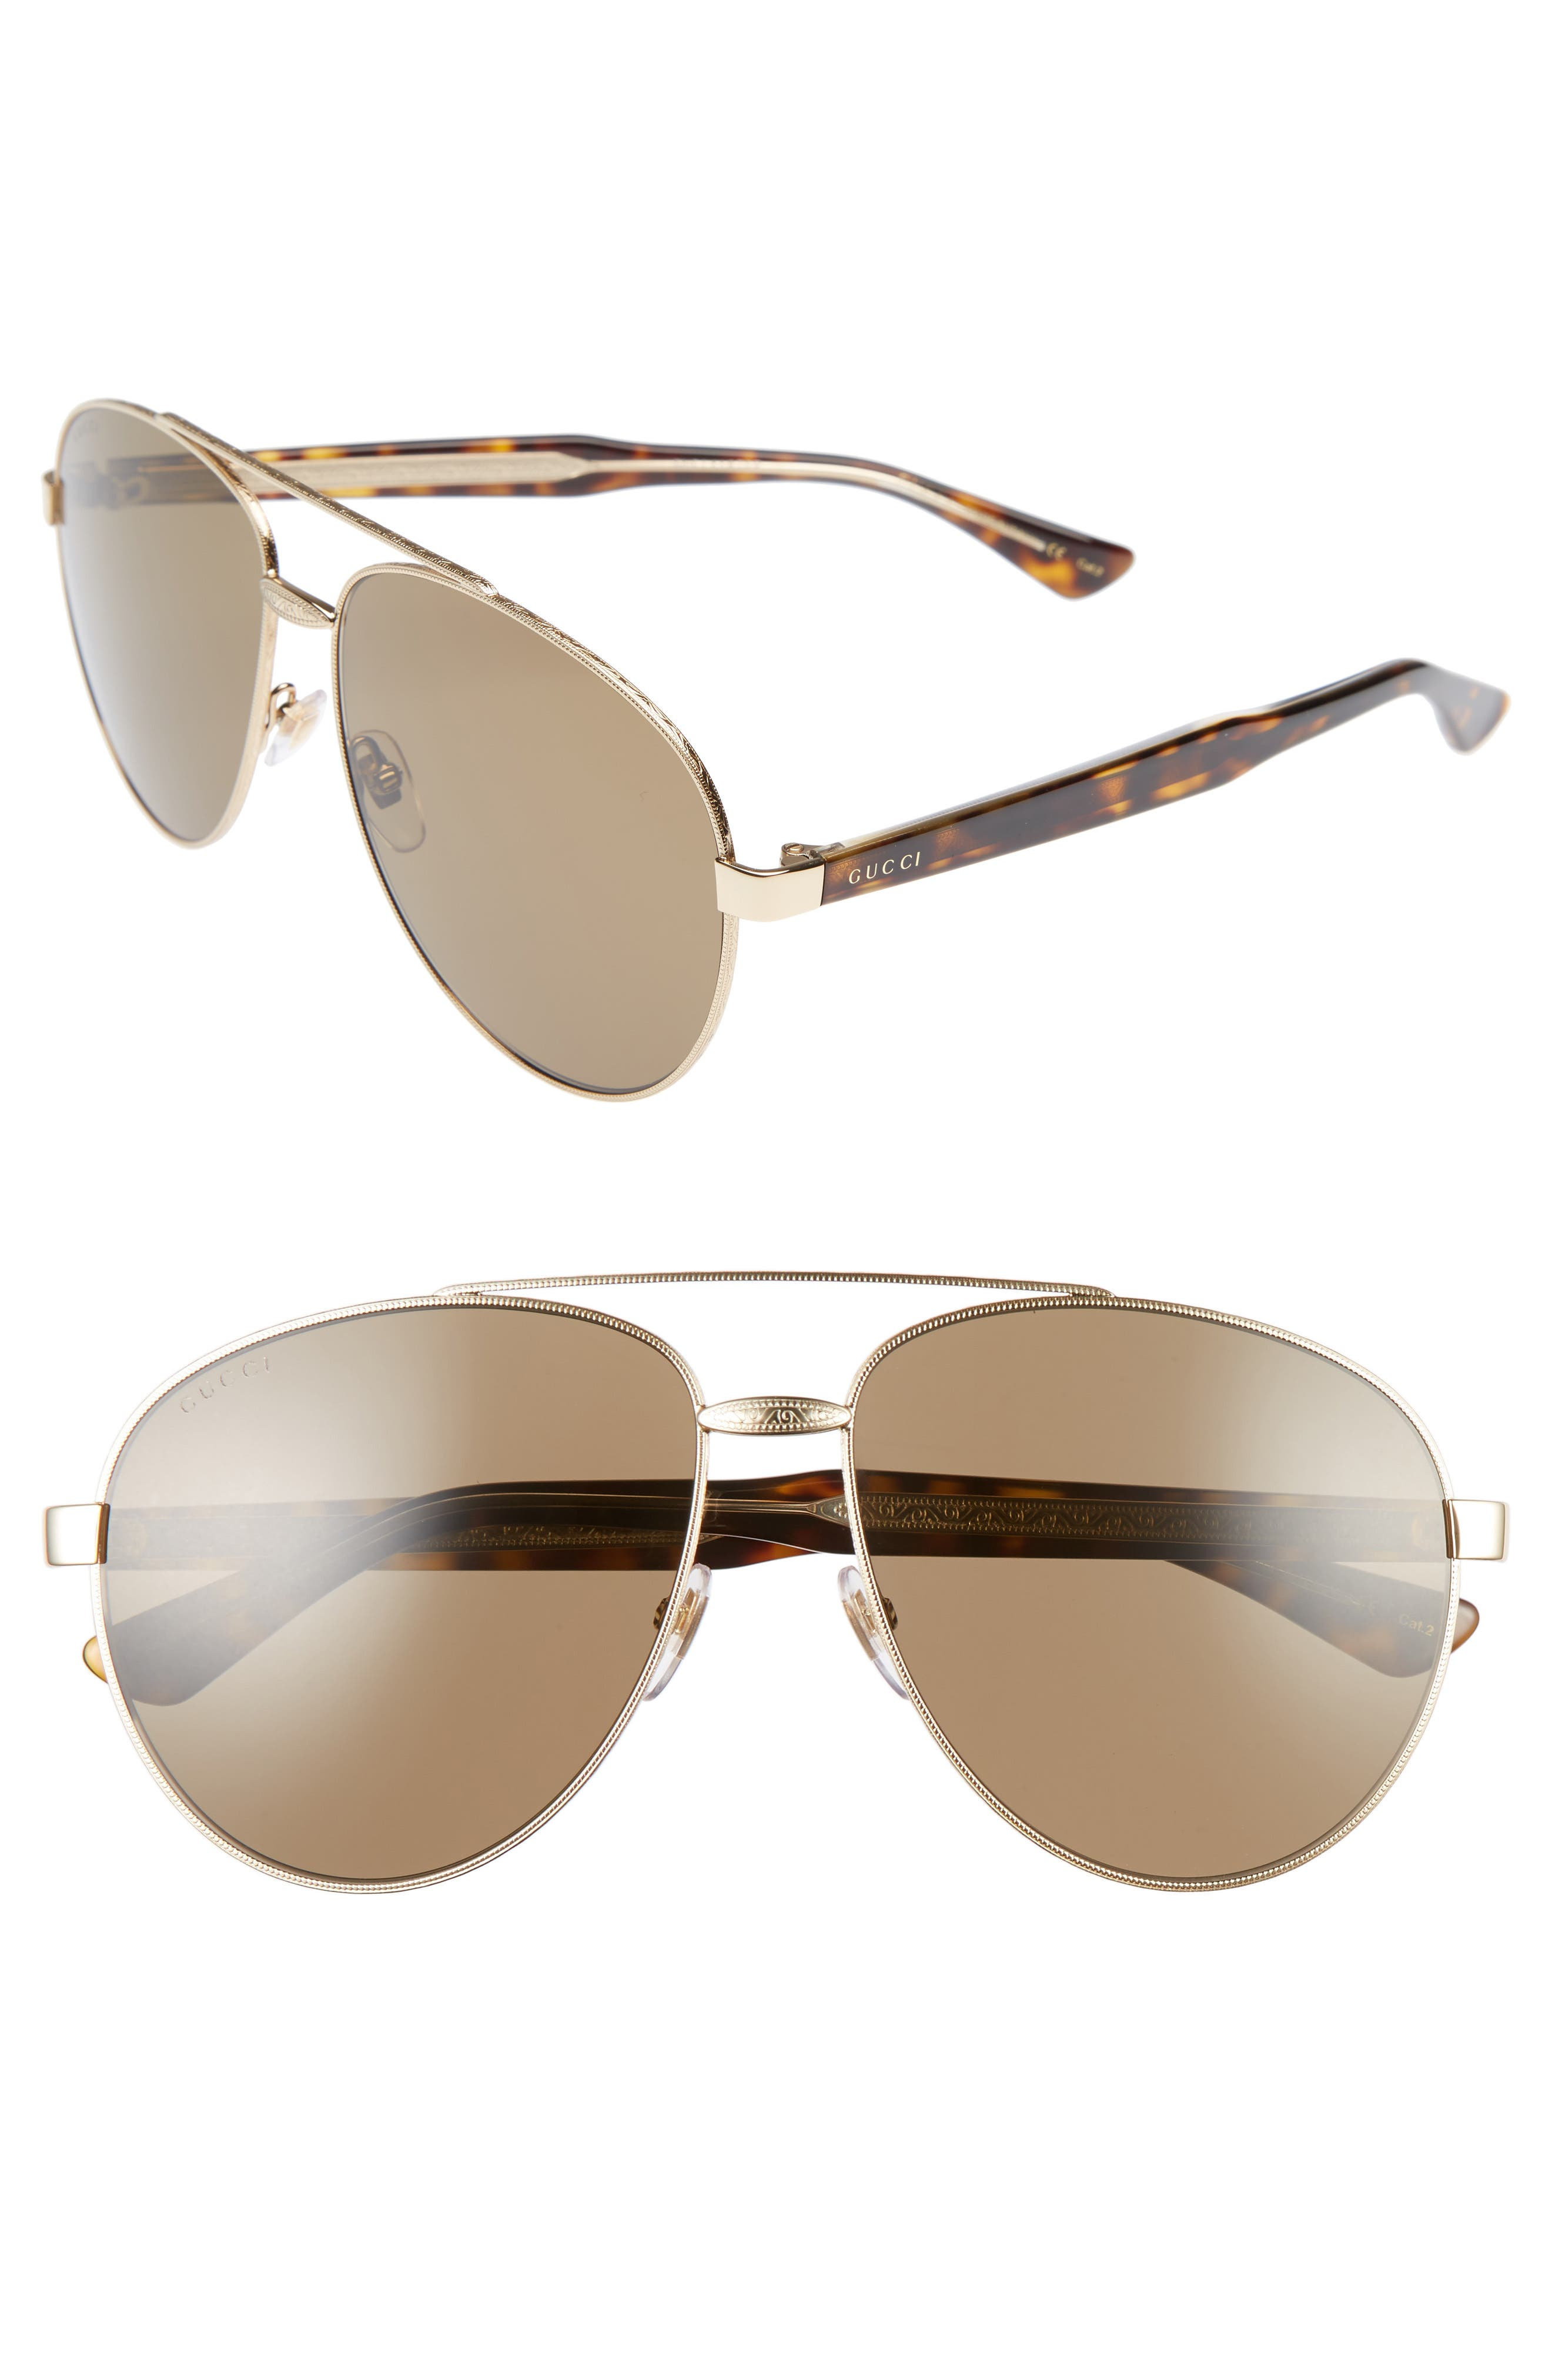 61mm Aviator Sunglasses,                             Main thumbnail 1, color,                             Gold/ Brown